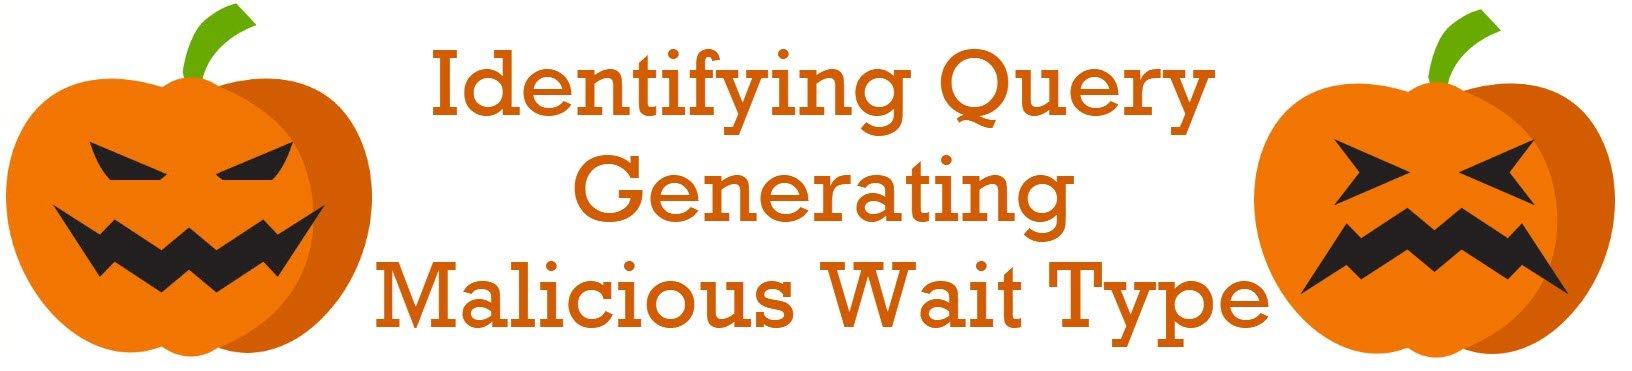 malicious Wait Type